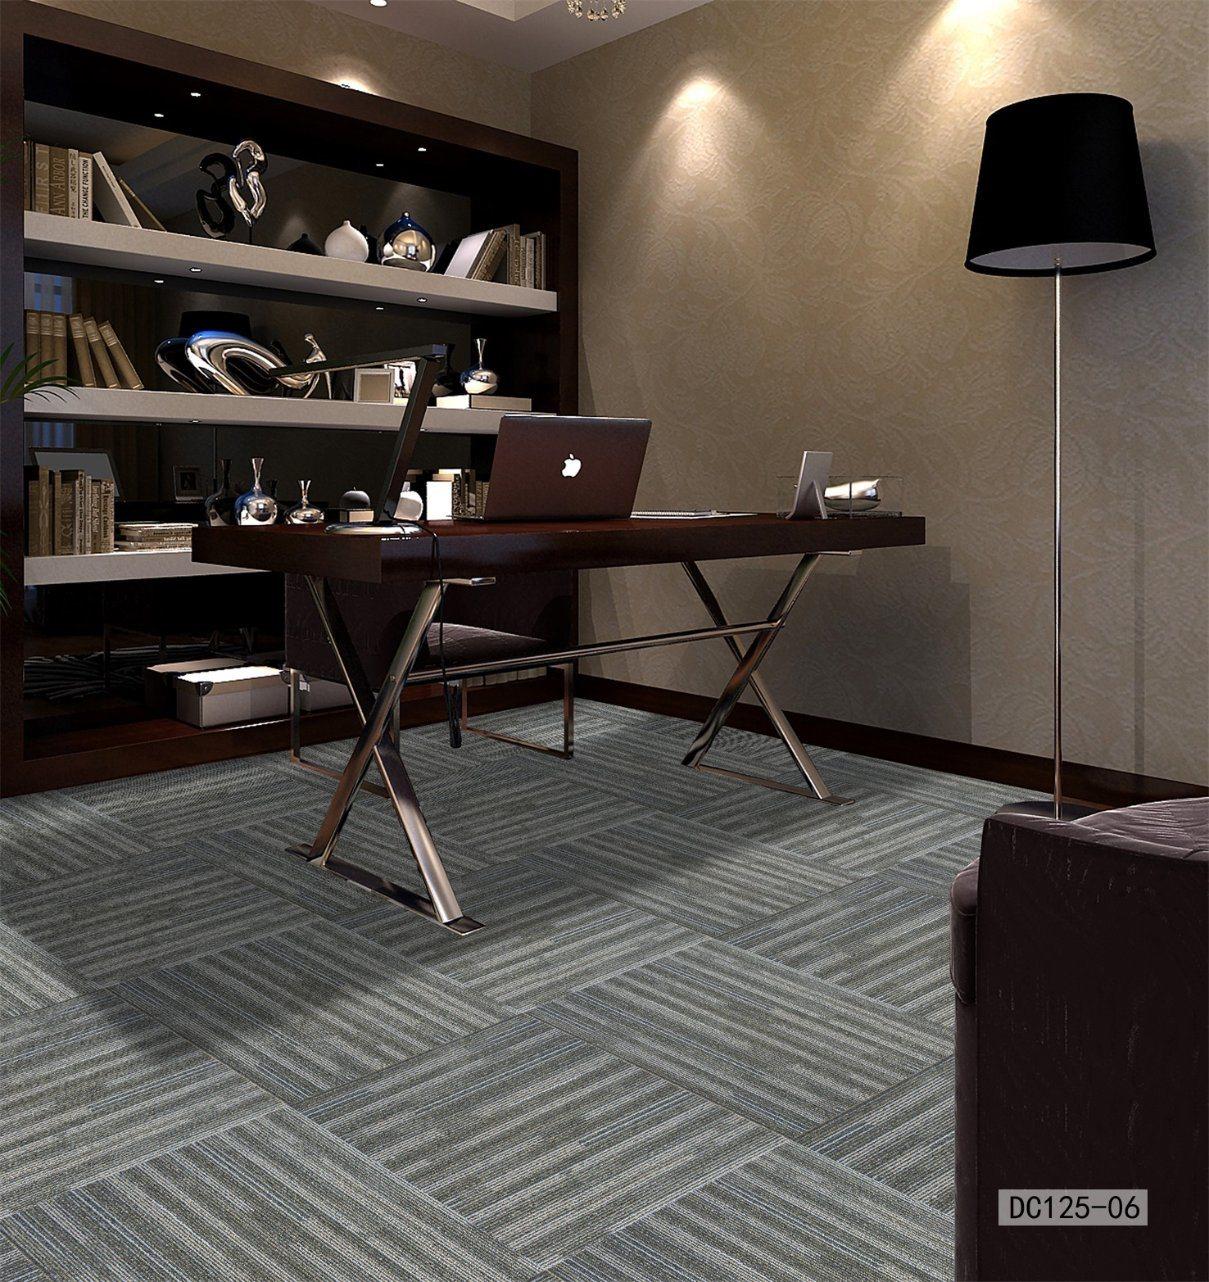 Image of: China Dc125 Commercial Hotel Home Office Carpet Tiles Nylon Pet Pp Carpet Hospital Carpet Stairway Carpet China Commercial Carpet Tiles And Office Carpet Tiles Price